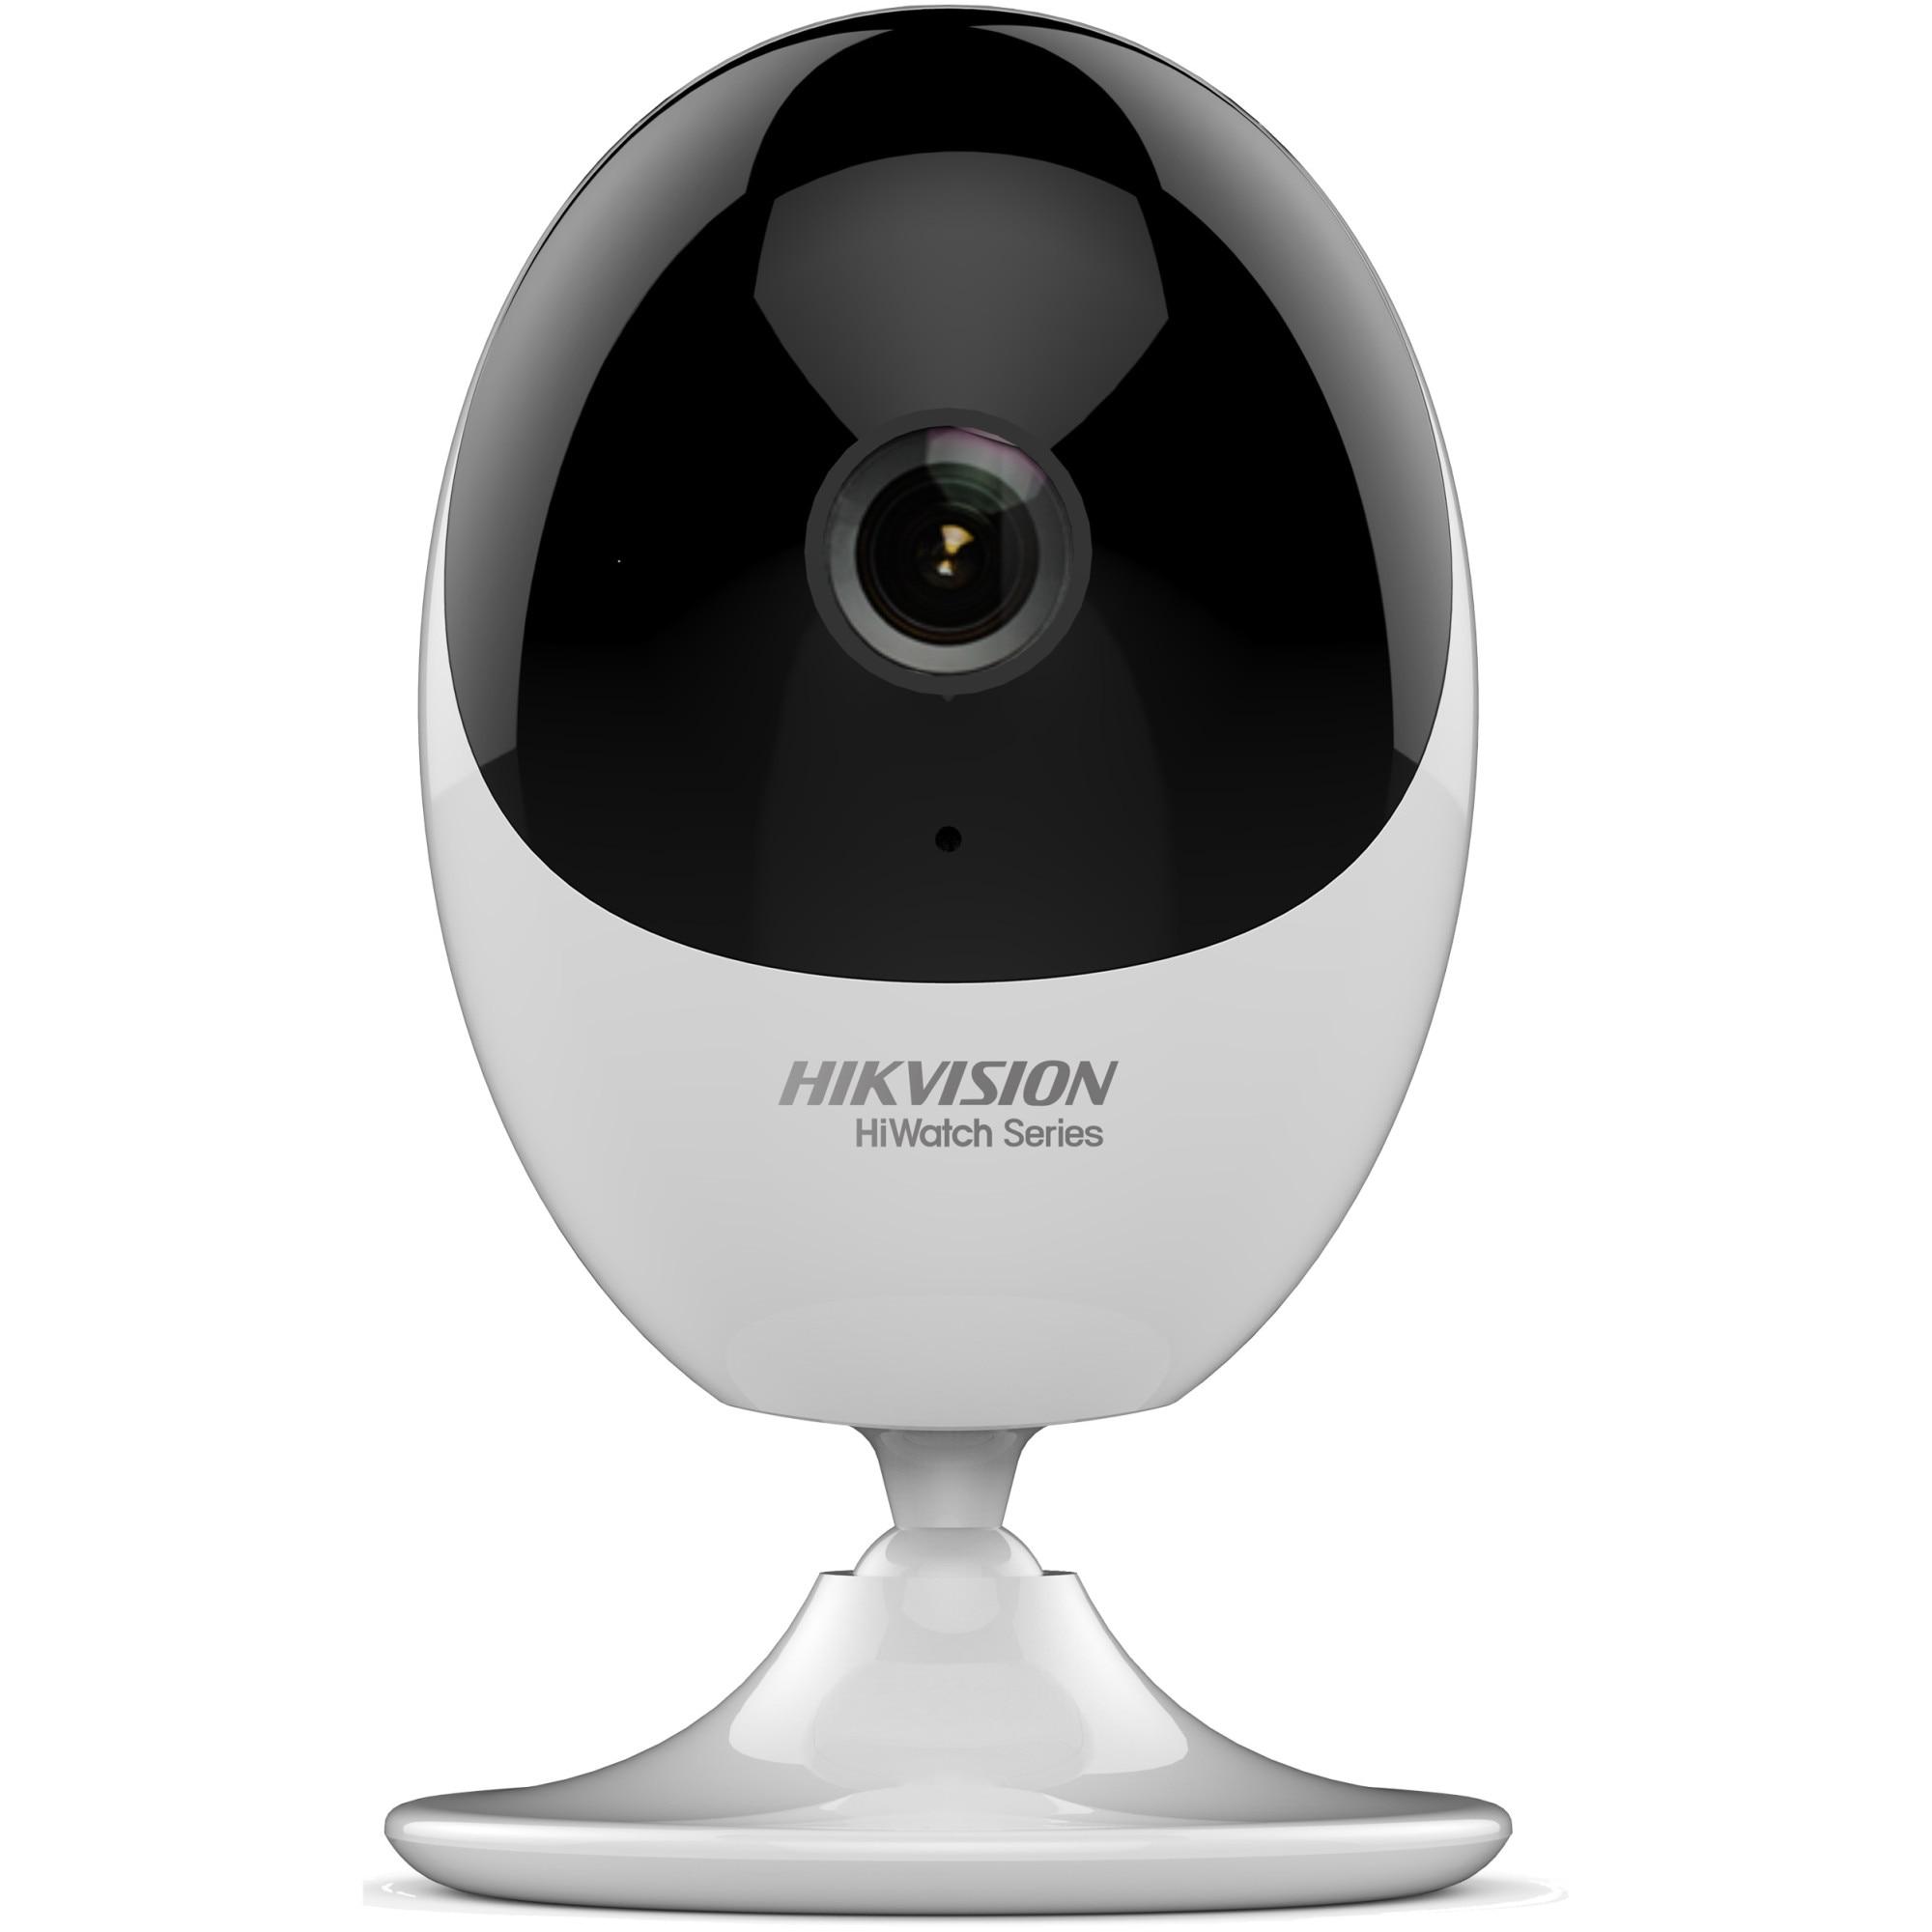 Fotografie Camera de supraveghere Hikvision HiWatch IP cube HWC-C120-D/W, 2MP, lentila 2.8mm, WIFI, IR 10m, Microfon si difuzor incorporat, Mobile Monitoring, Alb/Negru